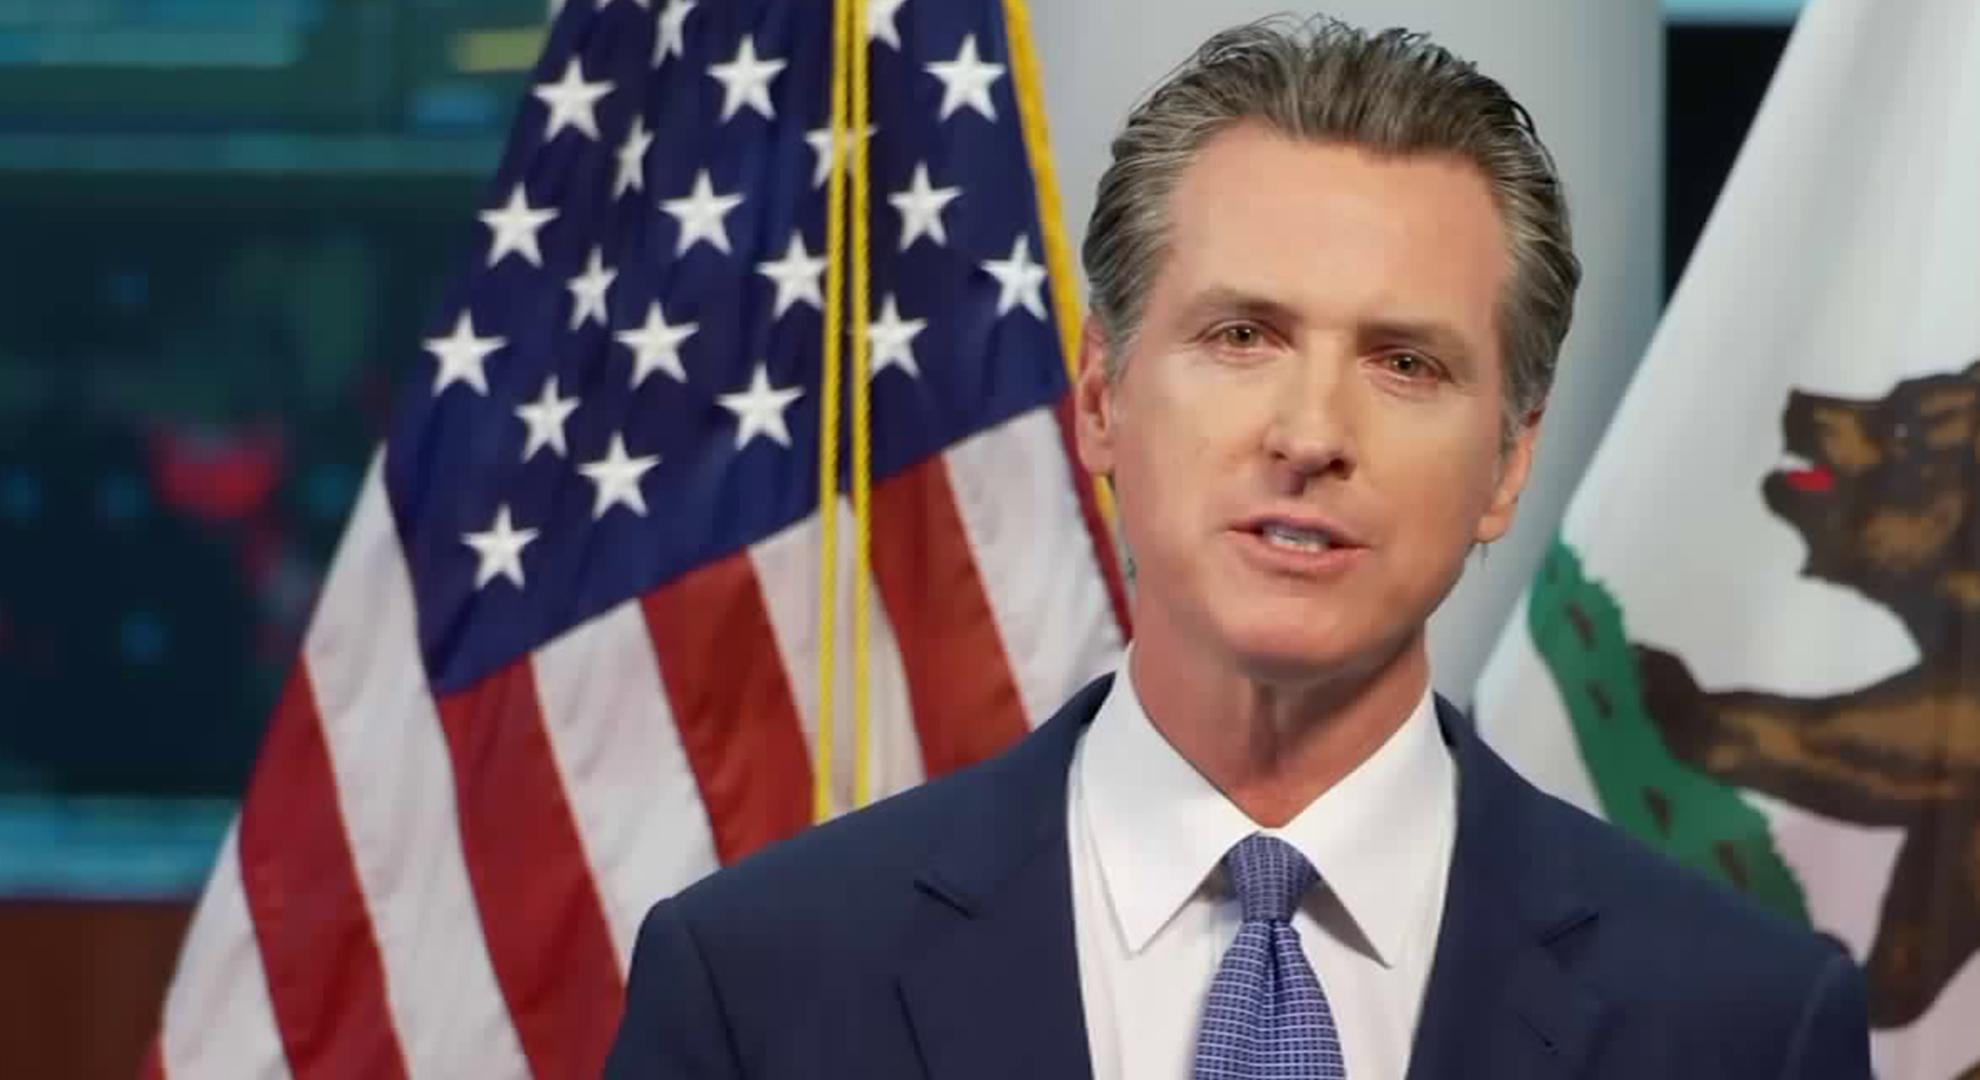 California Gov. Gavin Newsom addresses the COVID-19 outbreak in the state during a livestream on April 1, 2020.